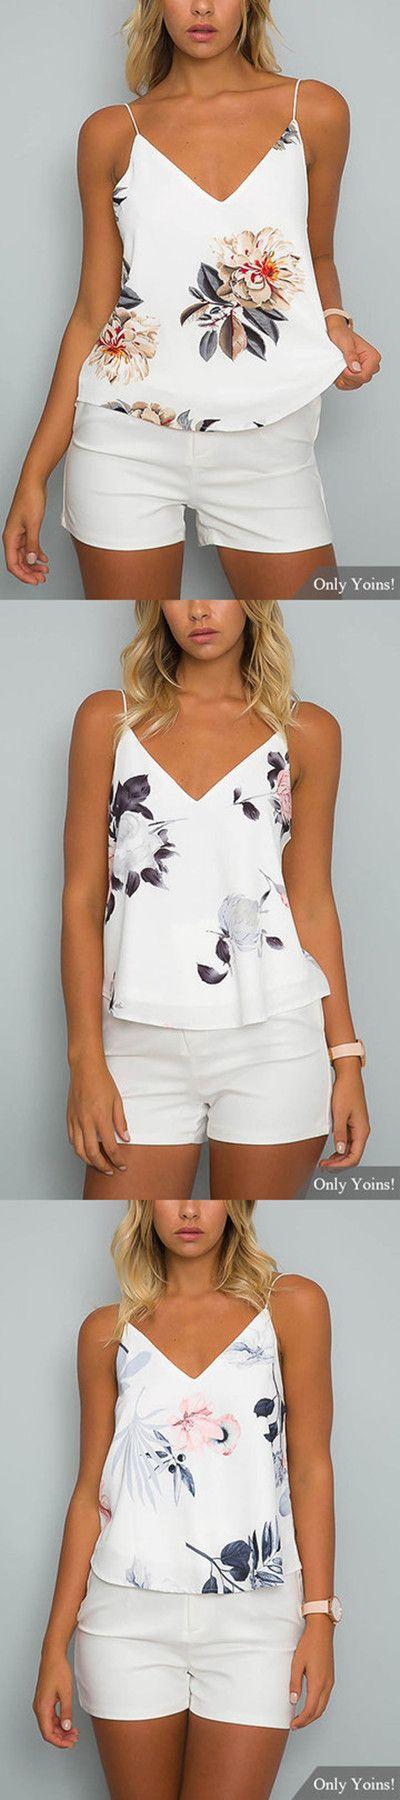 White V-neck Random Floral Print Cami Top